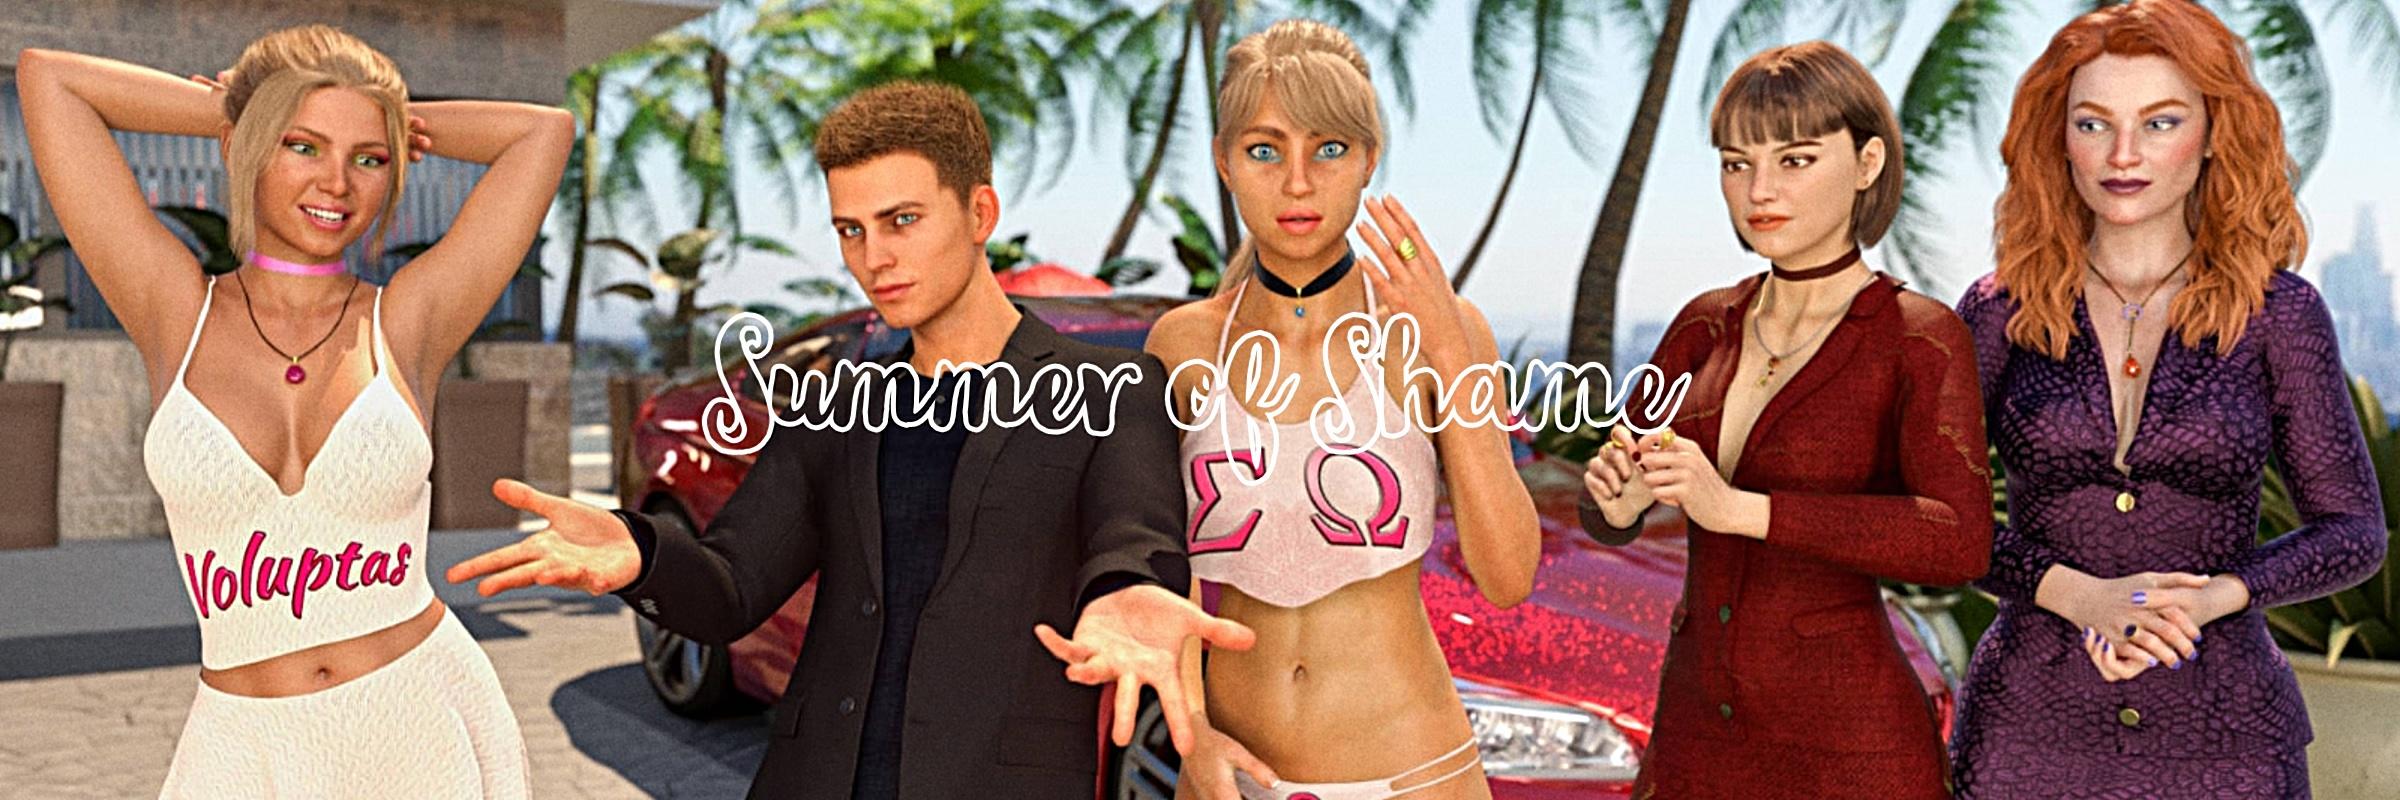 Summer of Shame [Logan Scodini]